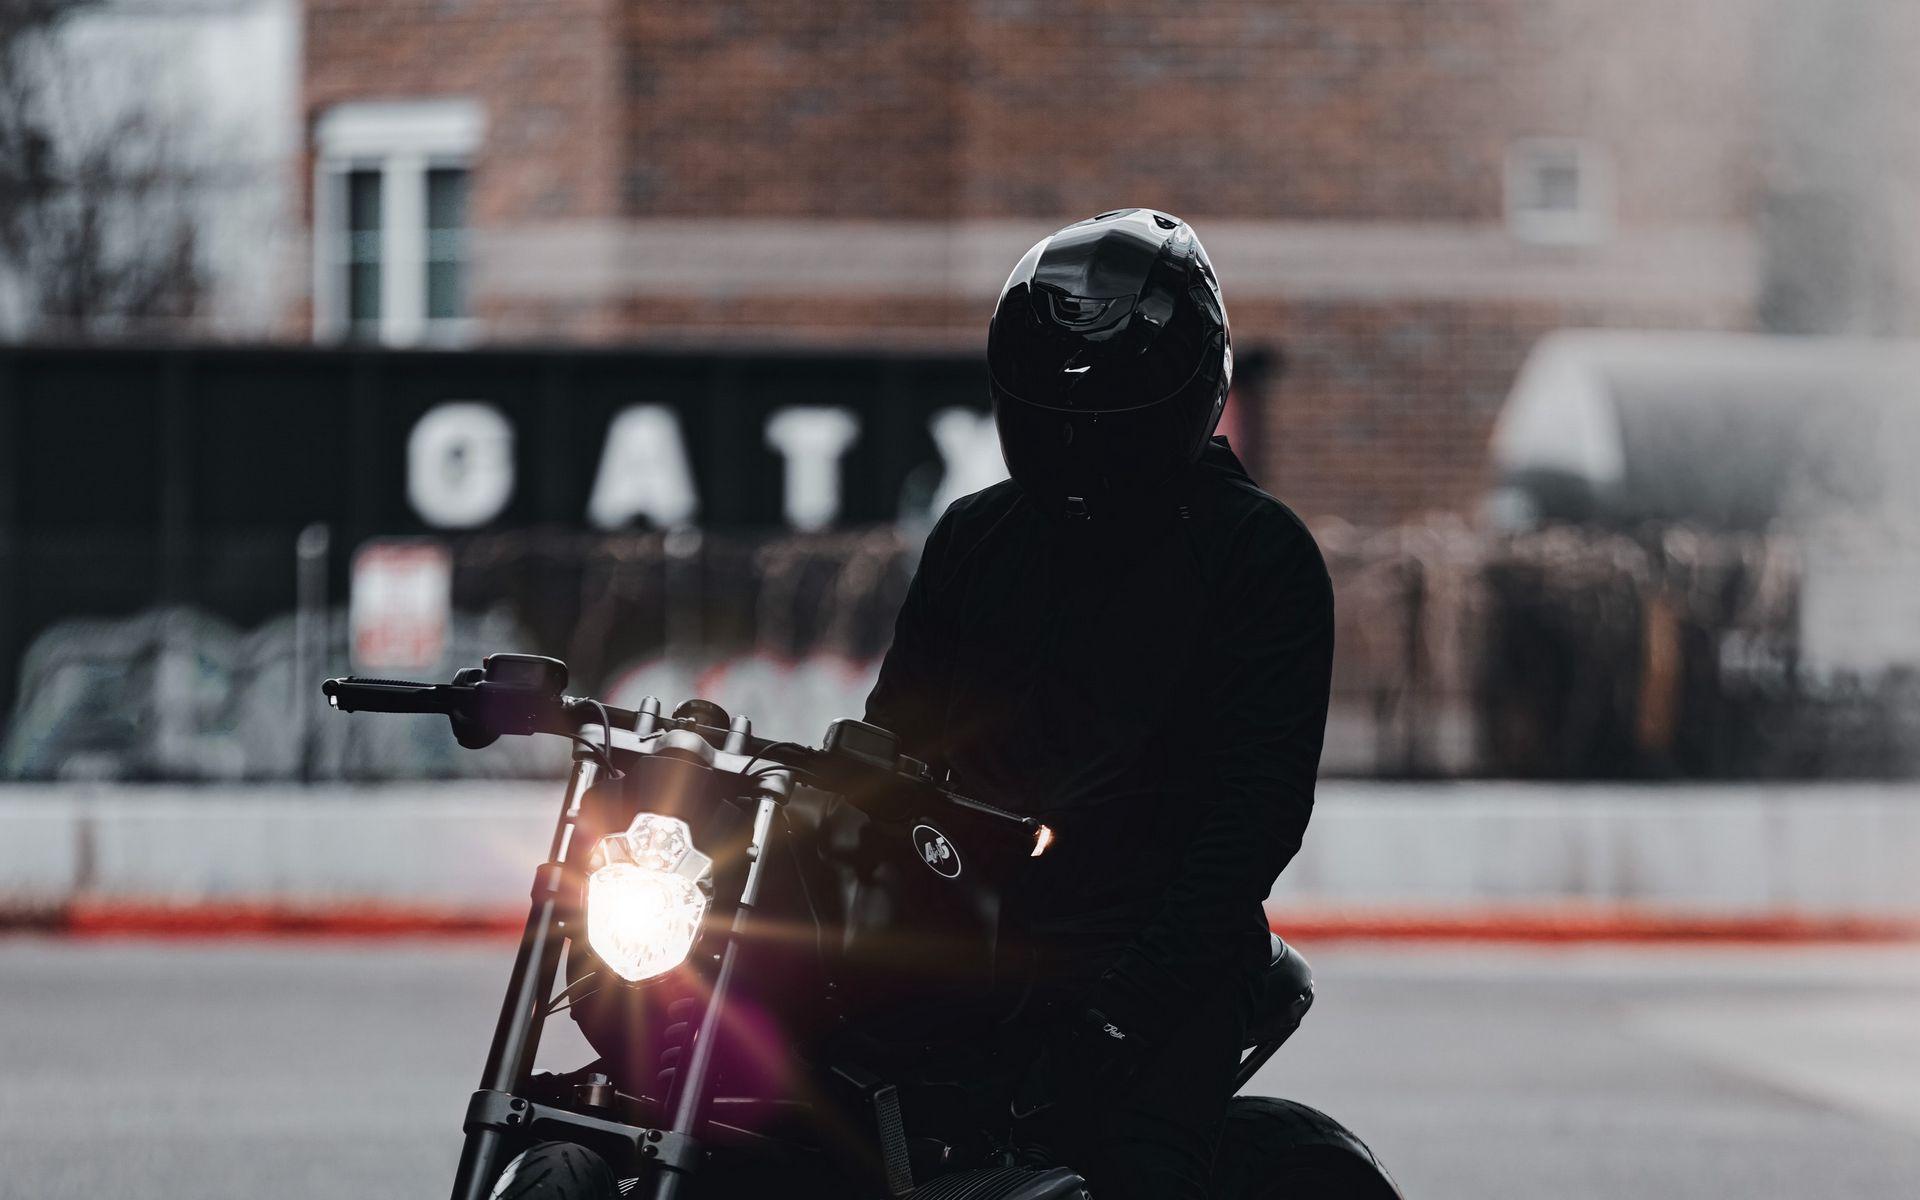 1920x1200 Обои мотоцикл, байк, мотоциклист, черный, свет, дорога